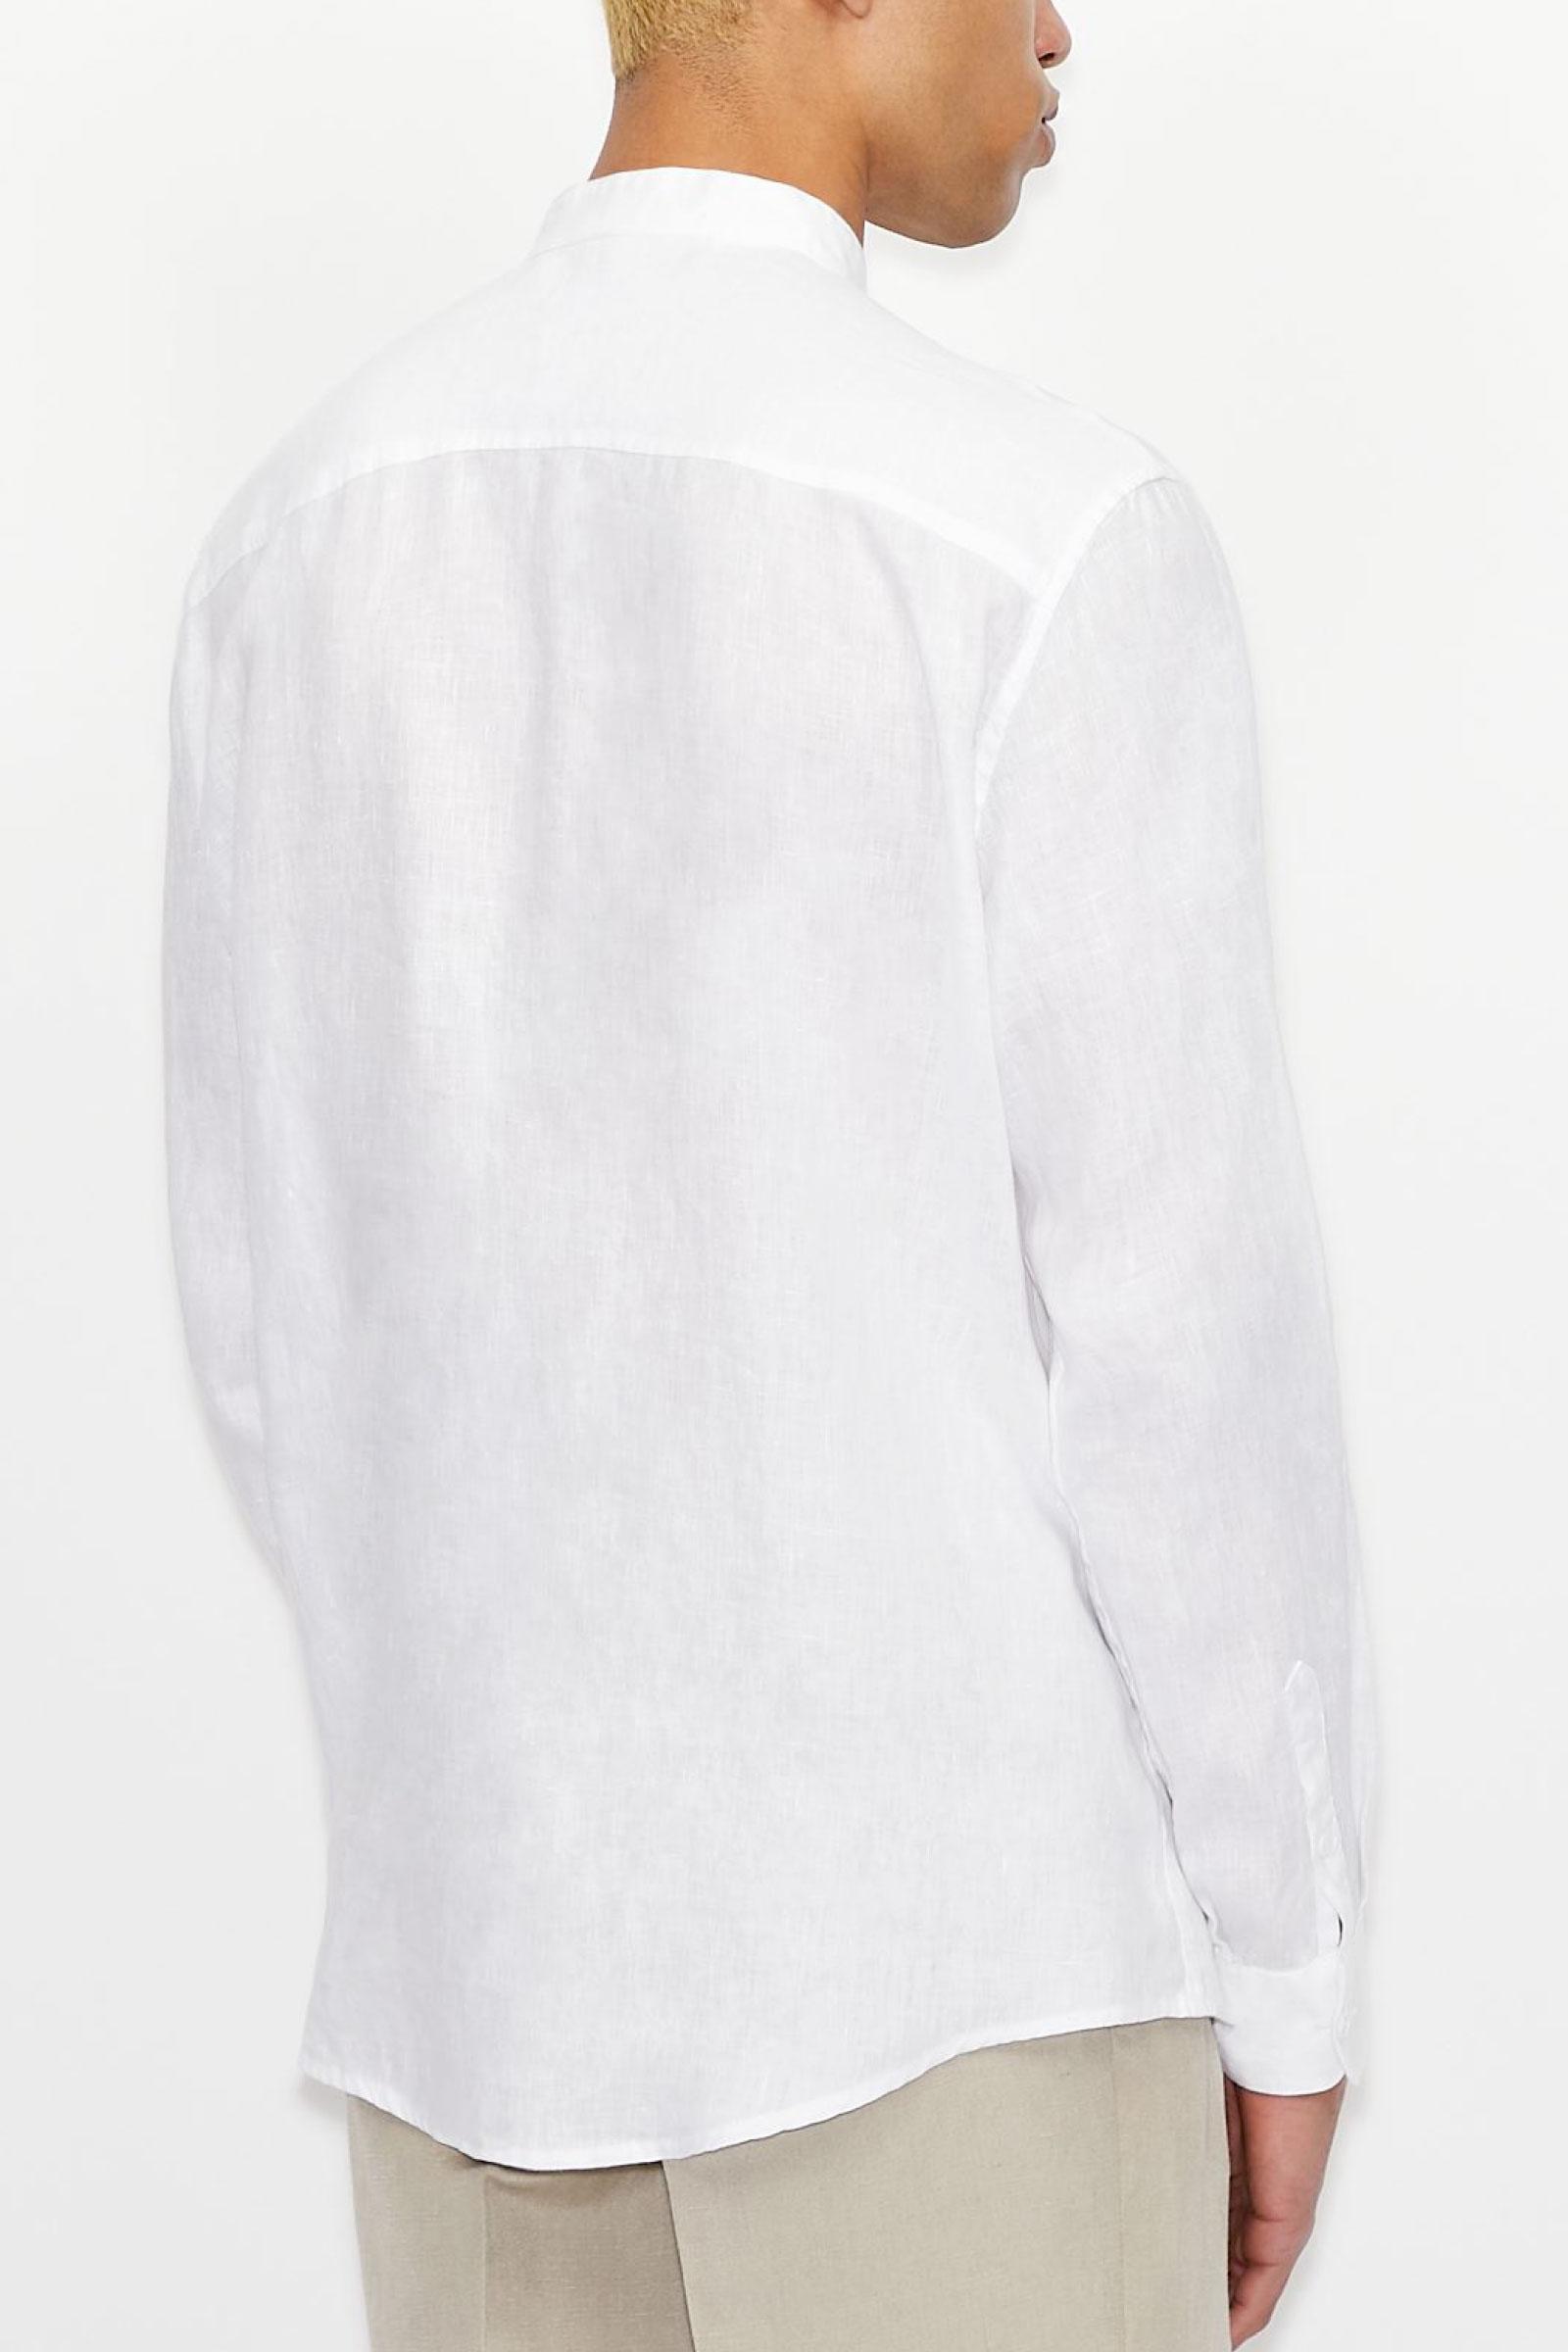 ARMANI EXCHANGE Camicia Uomo ARMANI EXCHANGE | Camicia | 3KZC69 ZNCFZ1100